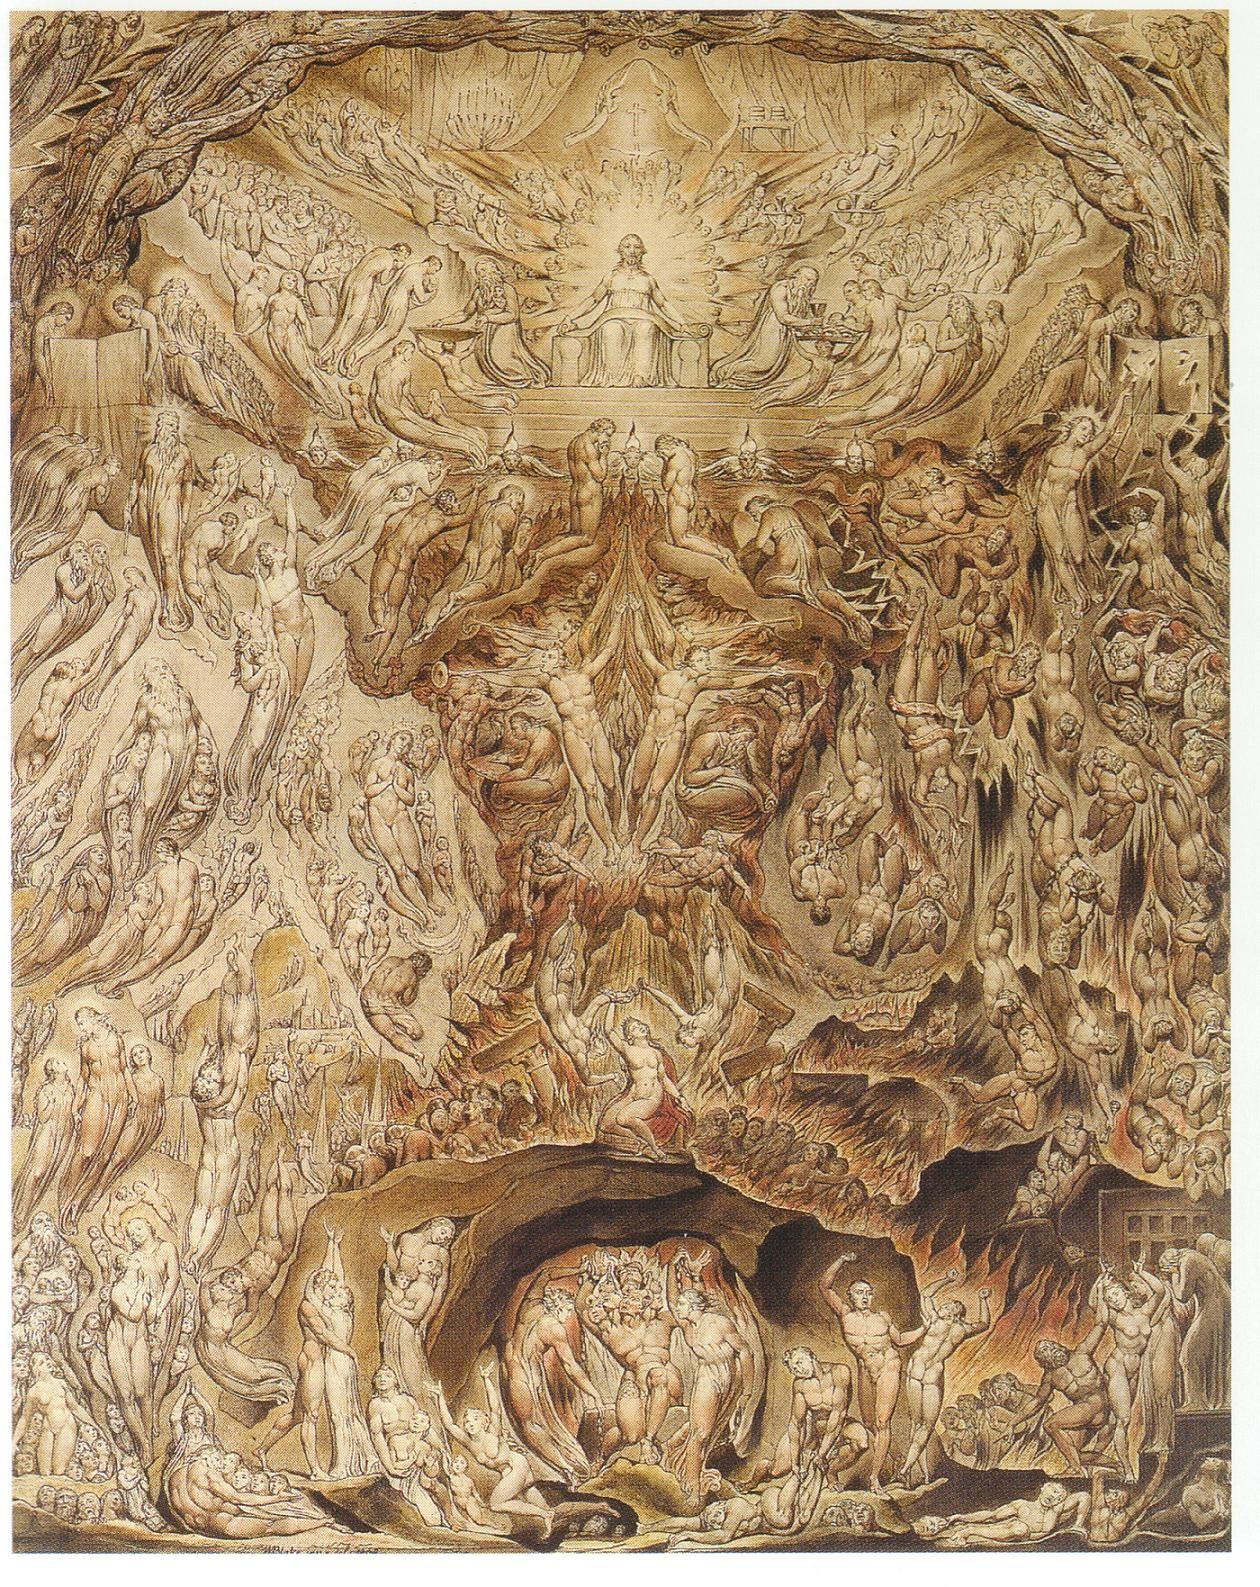 Satan Exulting Over Eve 1795 By William Blake Symbolism Religious